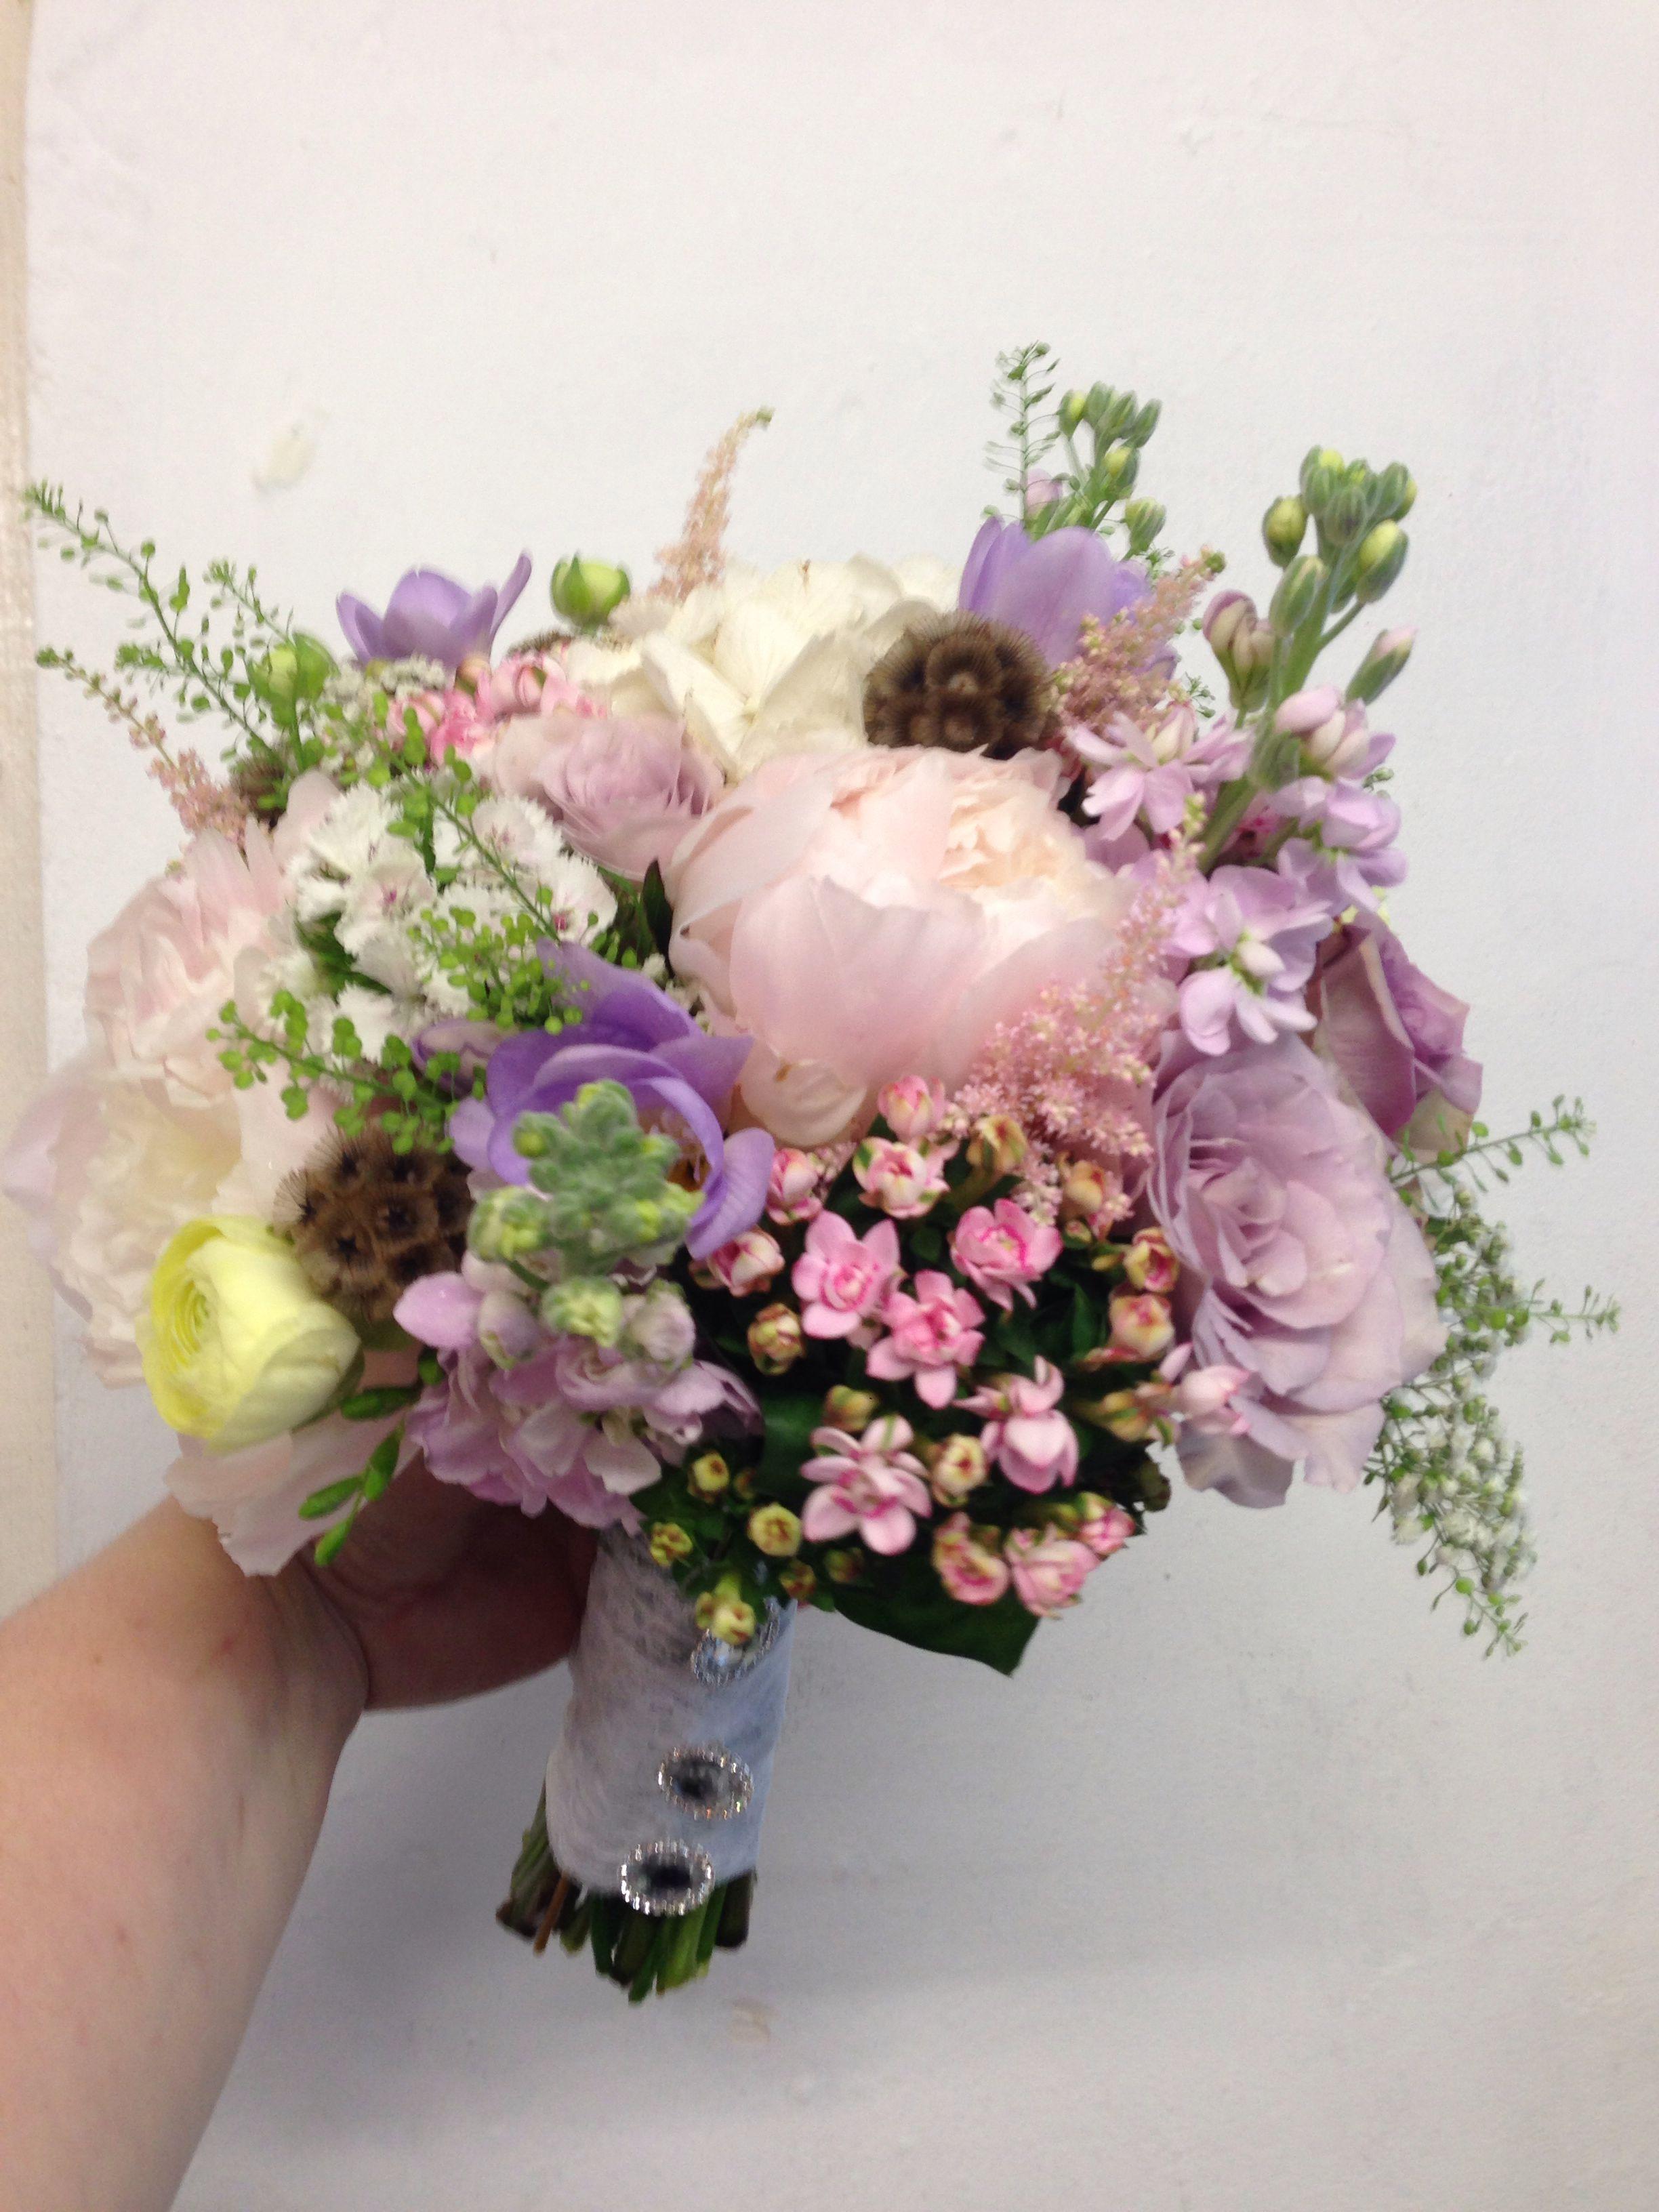 A textured mixed pastel hand tied posy bridal bouquet like us on a textured mixed pastel hand tied posy bridal bouquet like us on facebook search hocus crocus izmirmasajfo